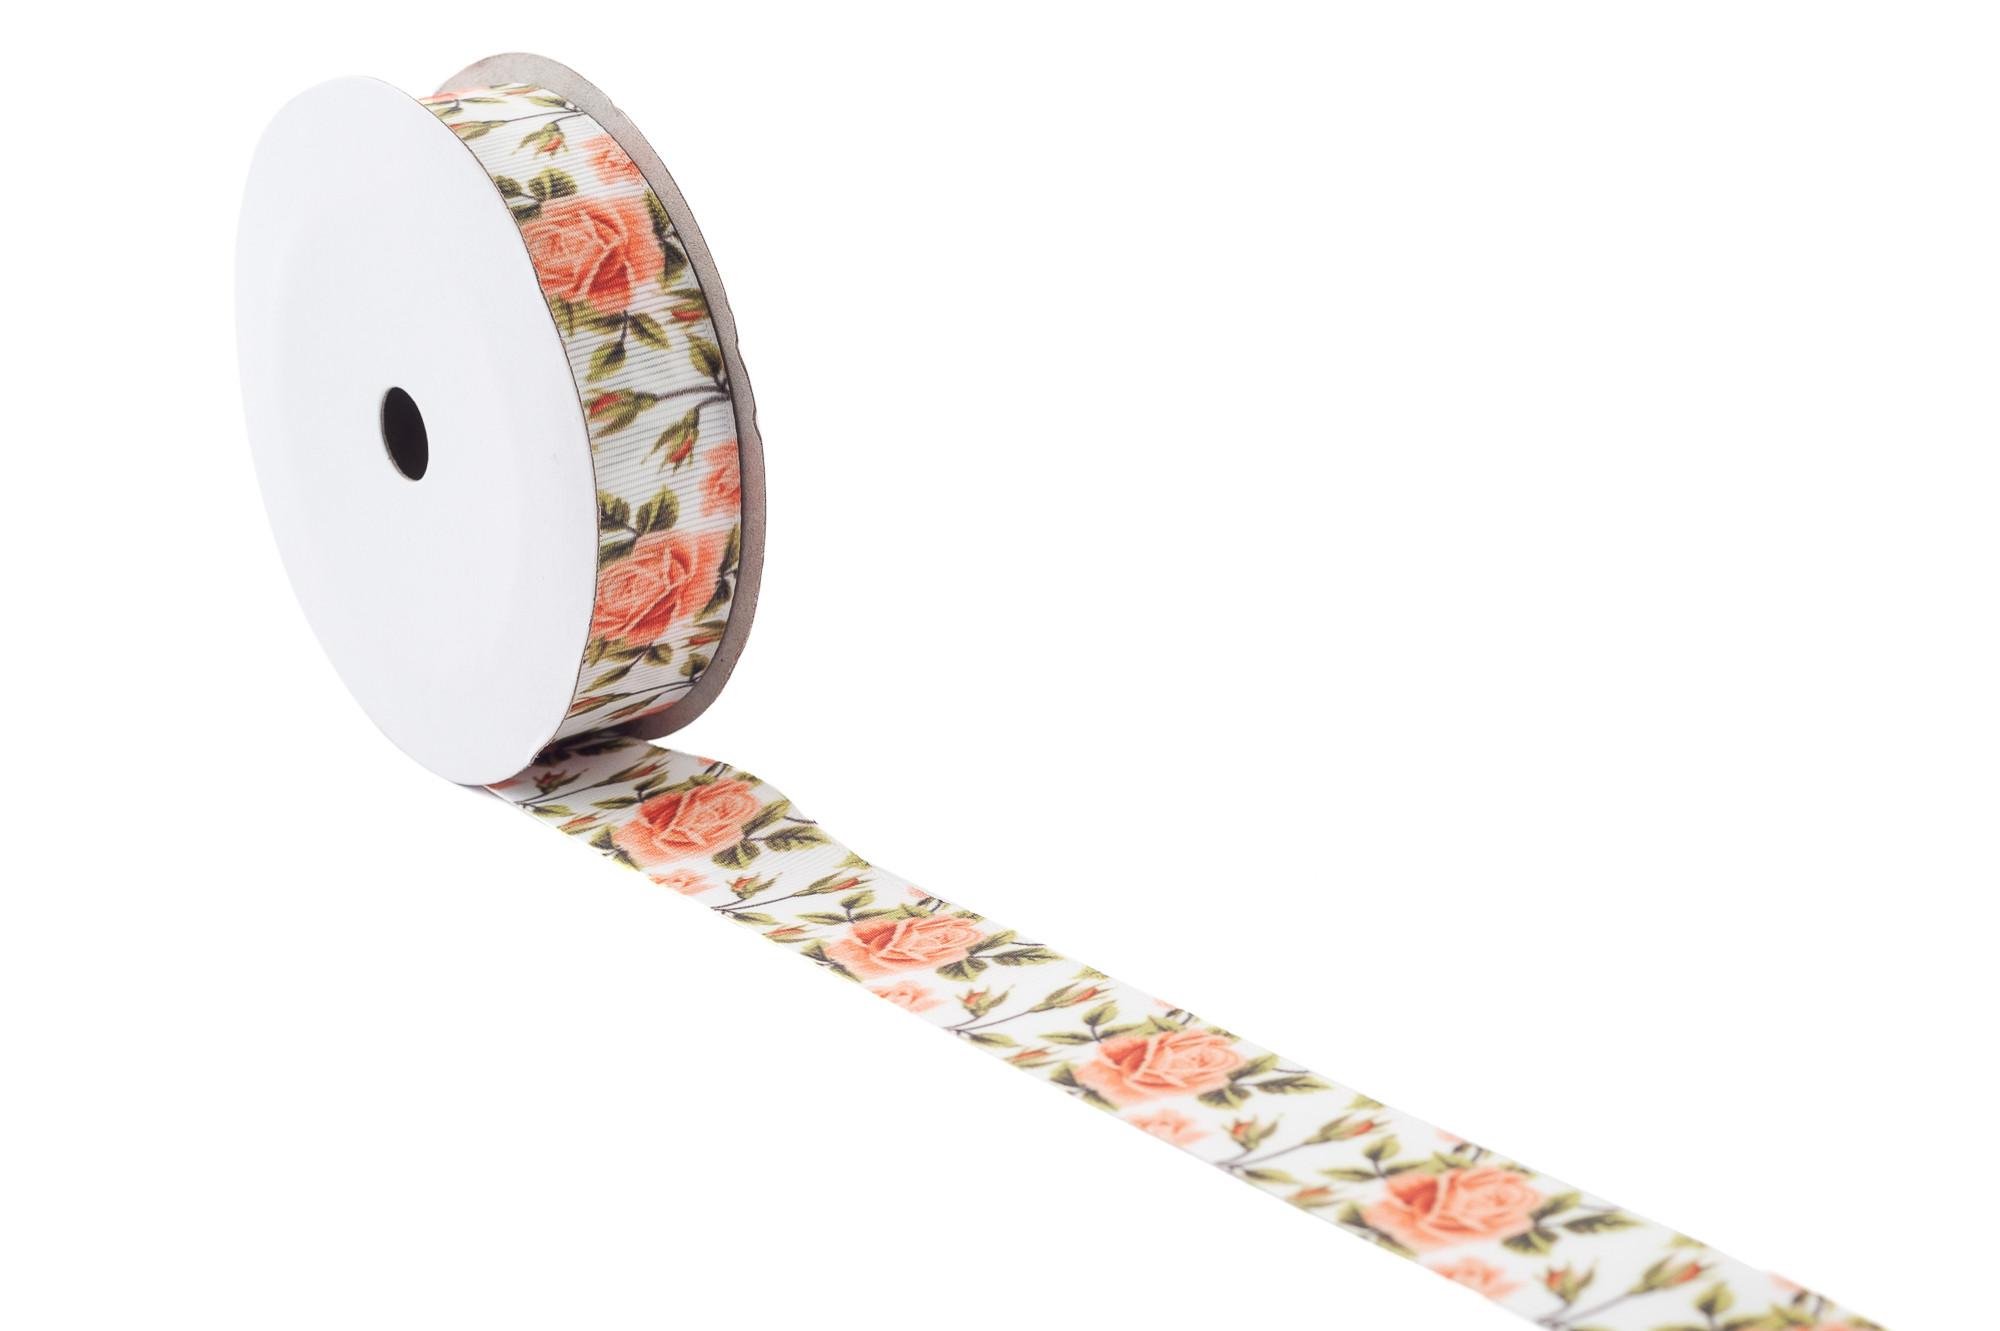 Rypsová stuha - čajová růže, 9 m